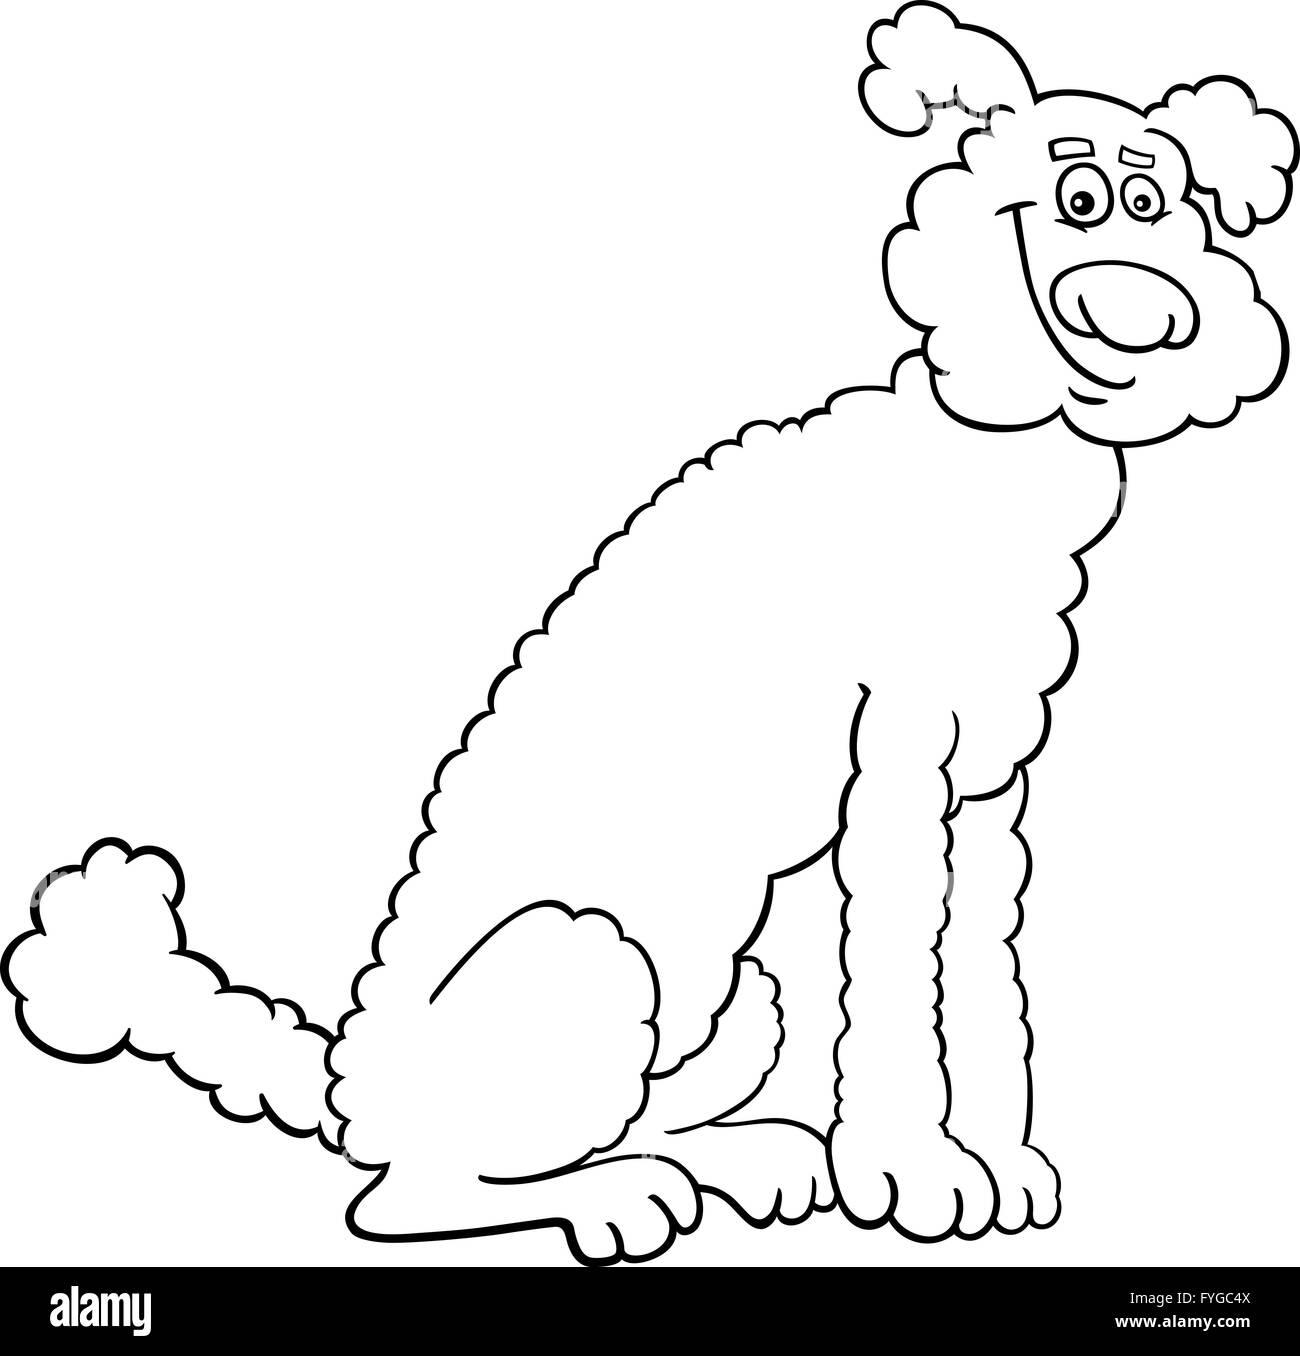 Pudel Hund Cartoon für Malbuch Stockfoto, Bild: 103008330 - Alamy